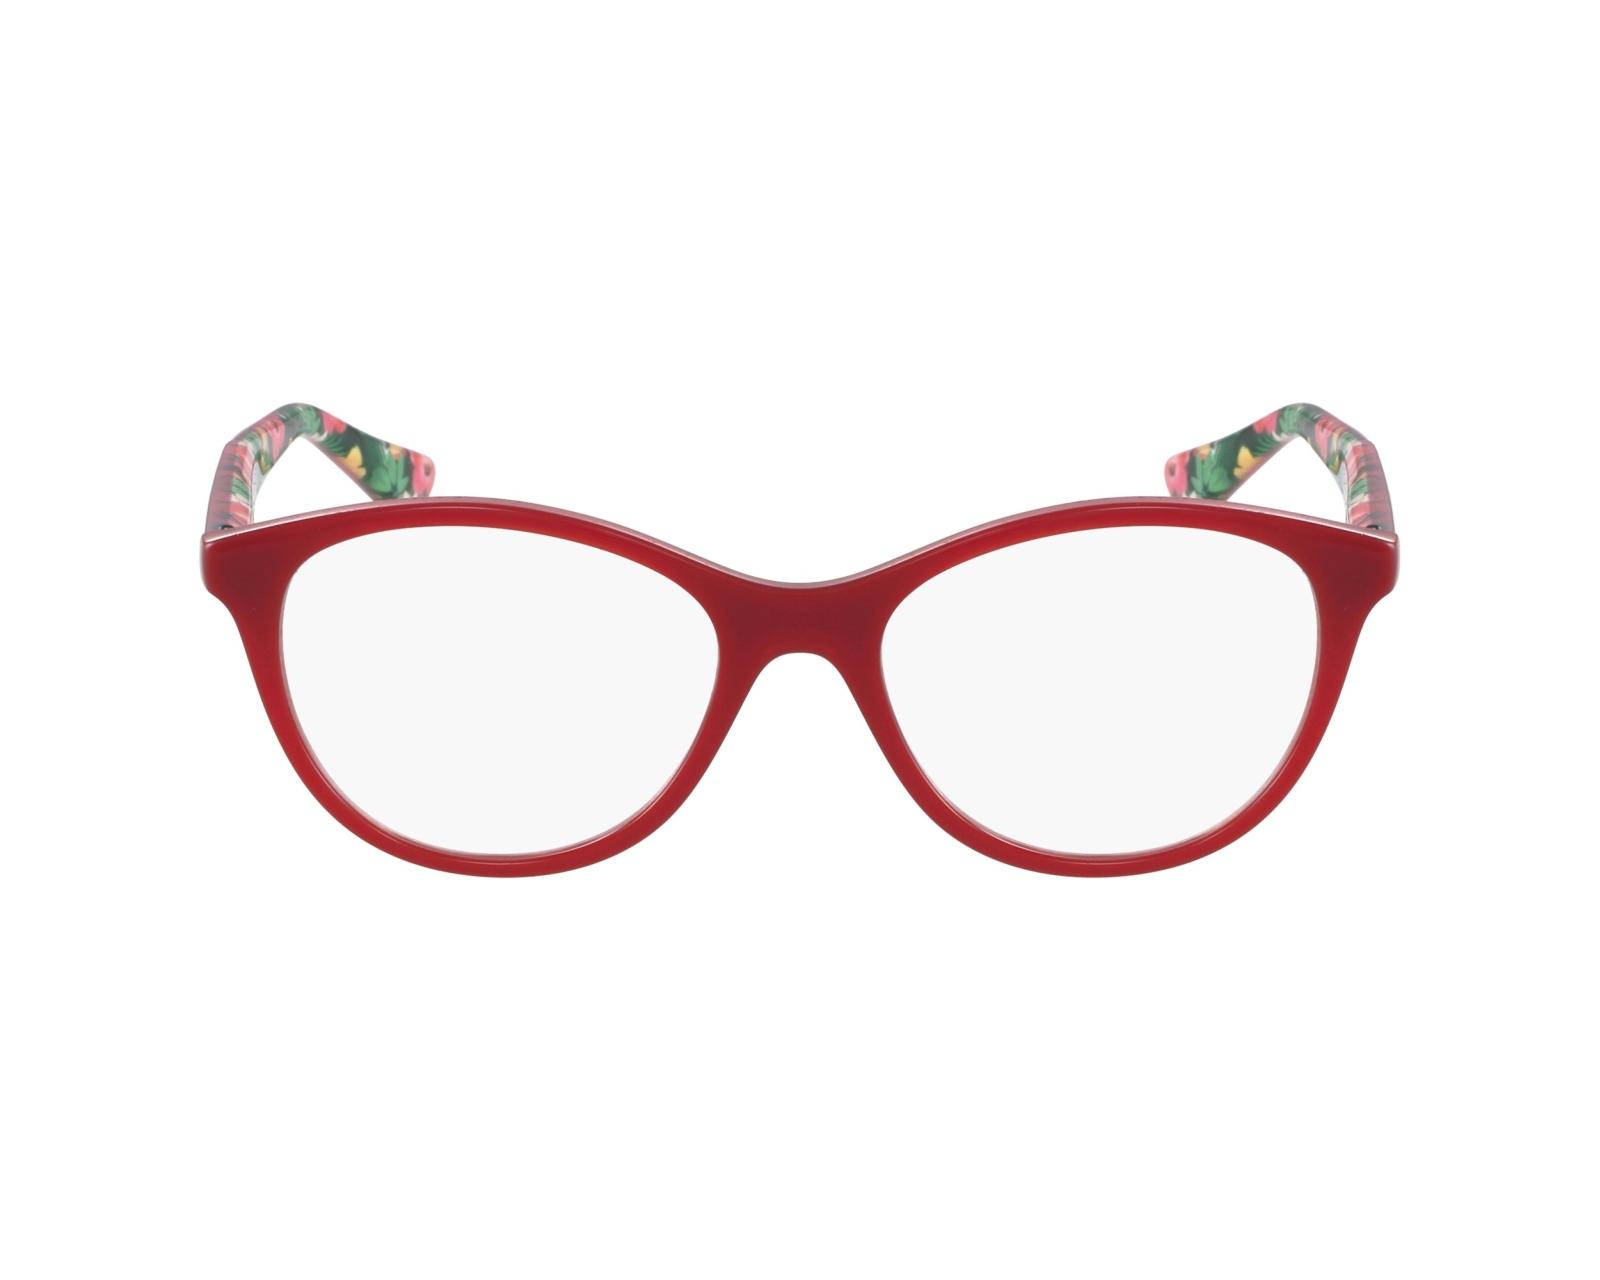 acheter des lunettes de vue vogue vo 2988 2340 visionet. Black Bedroom Furniture Sets. Home Design Ideas